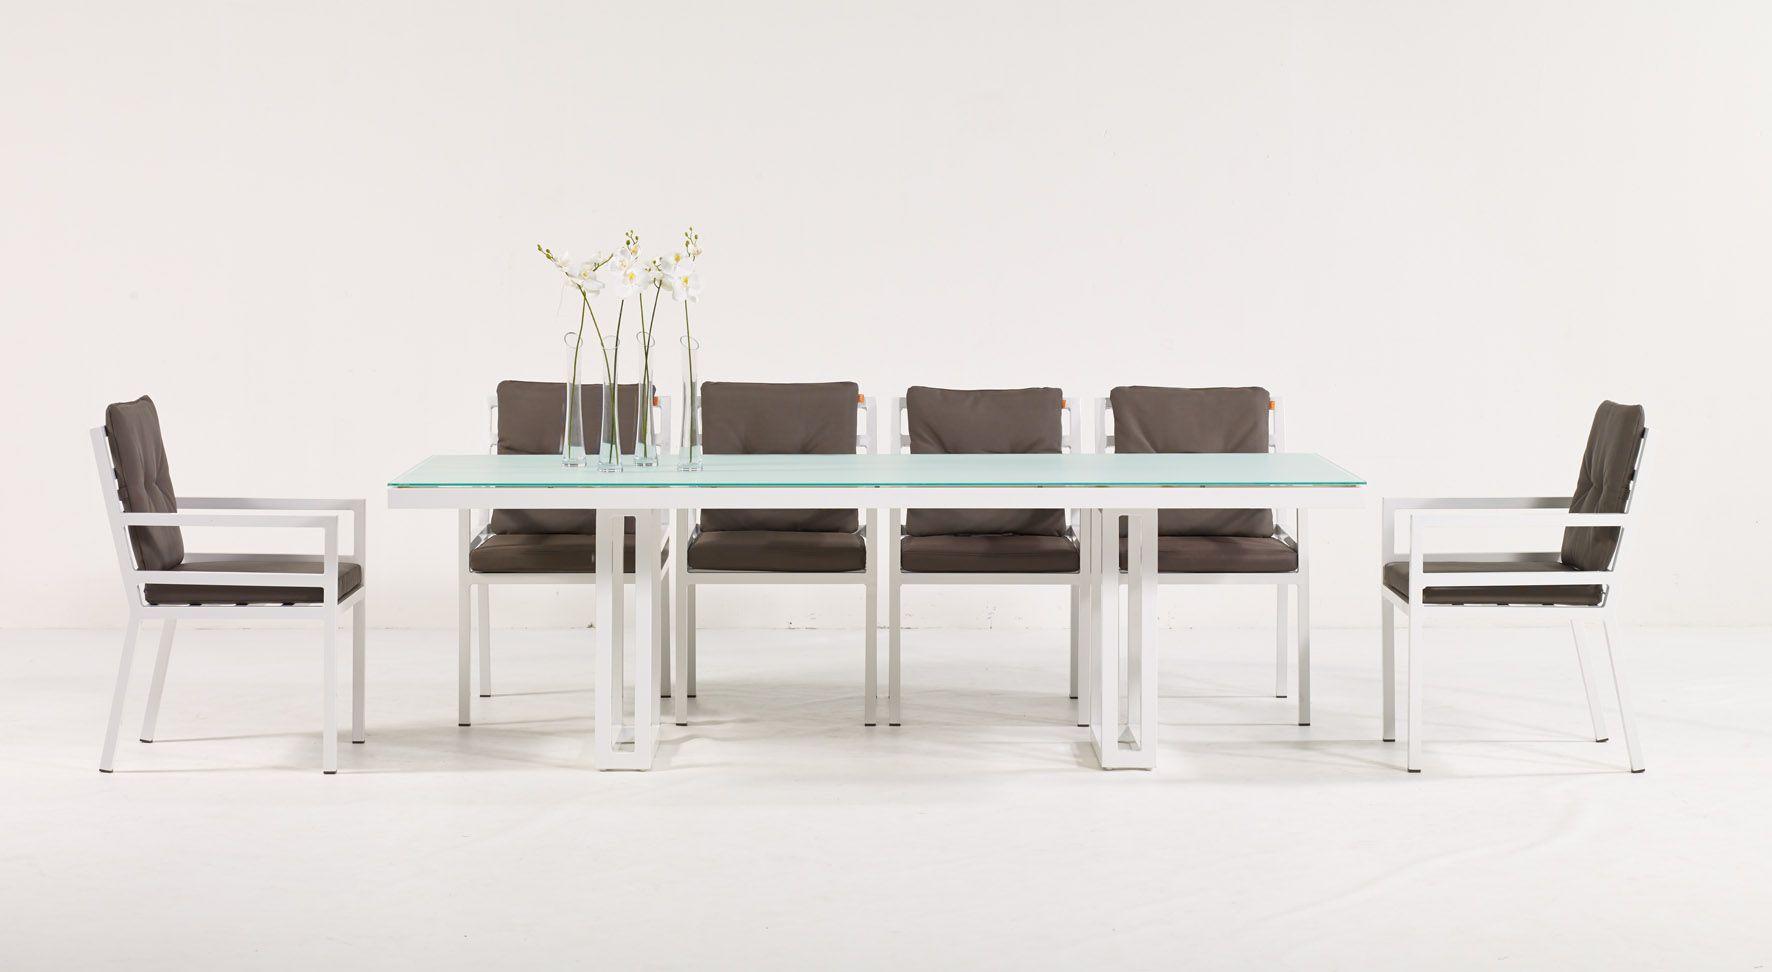 lima dining set 240x100 0514life set22 latour tuinmeubelen outlet. Black Bedroom Furniture Sets. Home Design Ideas